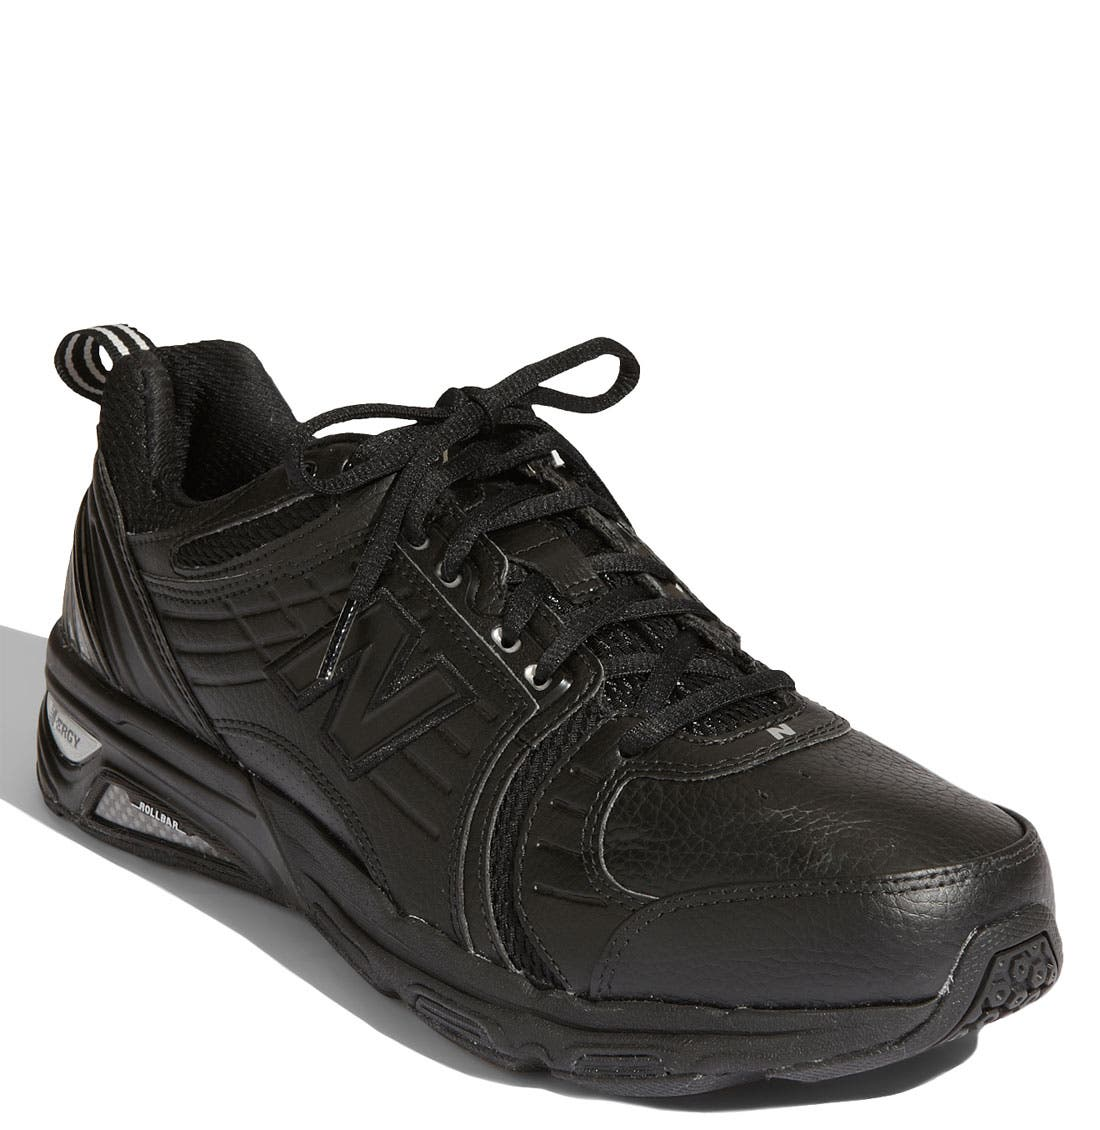 Main Image - New Balance '856' Training Shoe (Men) (Online Only)